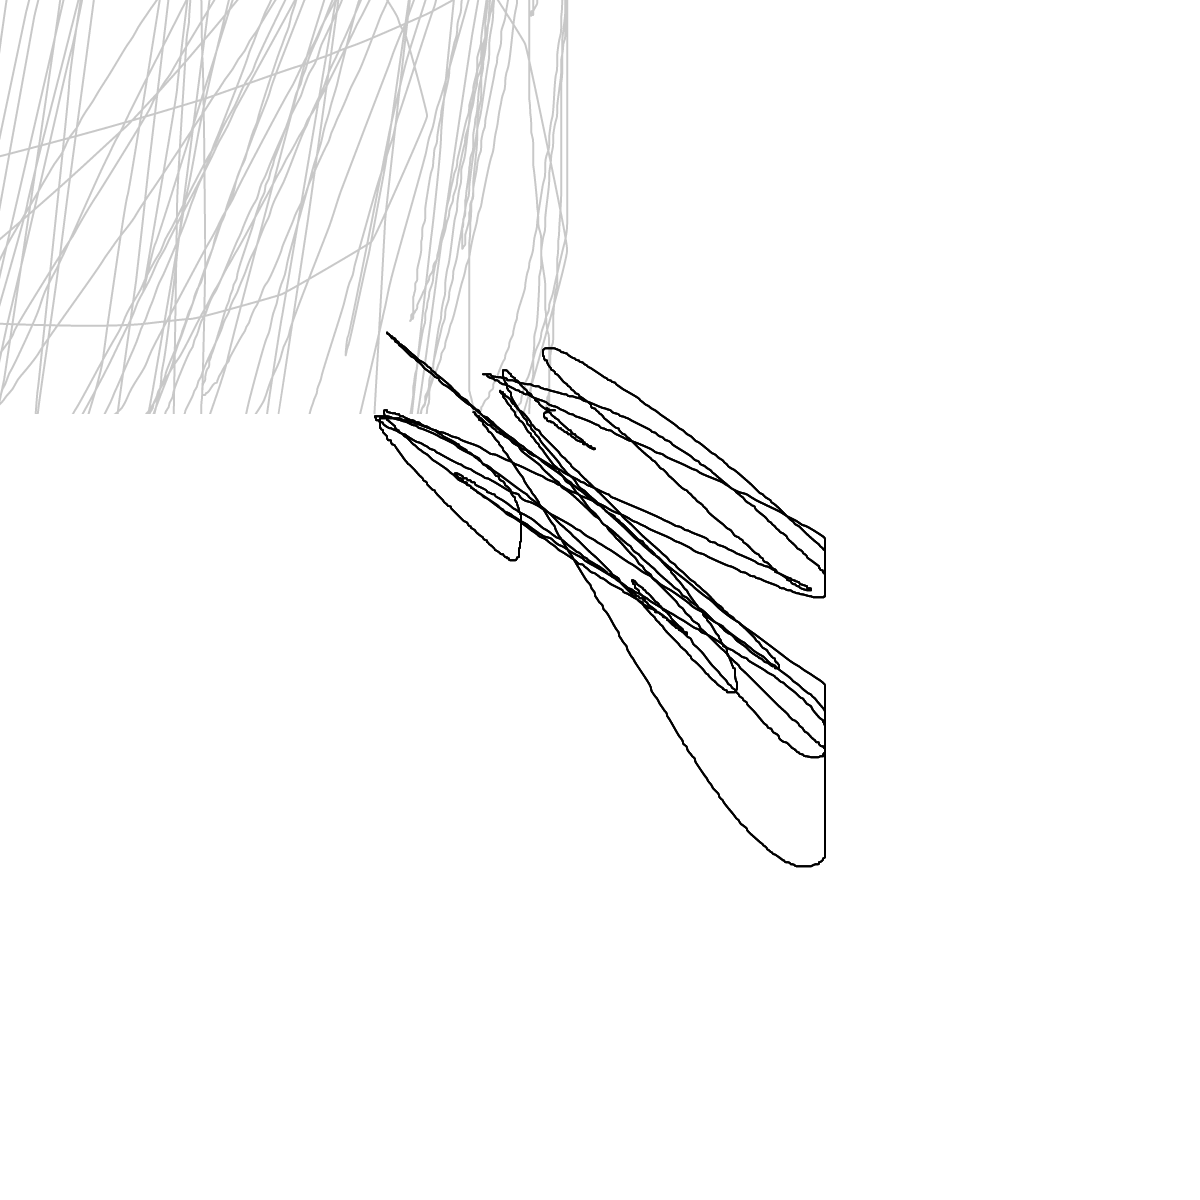 BAAAM drawing#23070 lat:52.4761123657226560lng: 13.4050712585449220